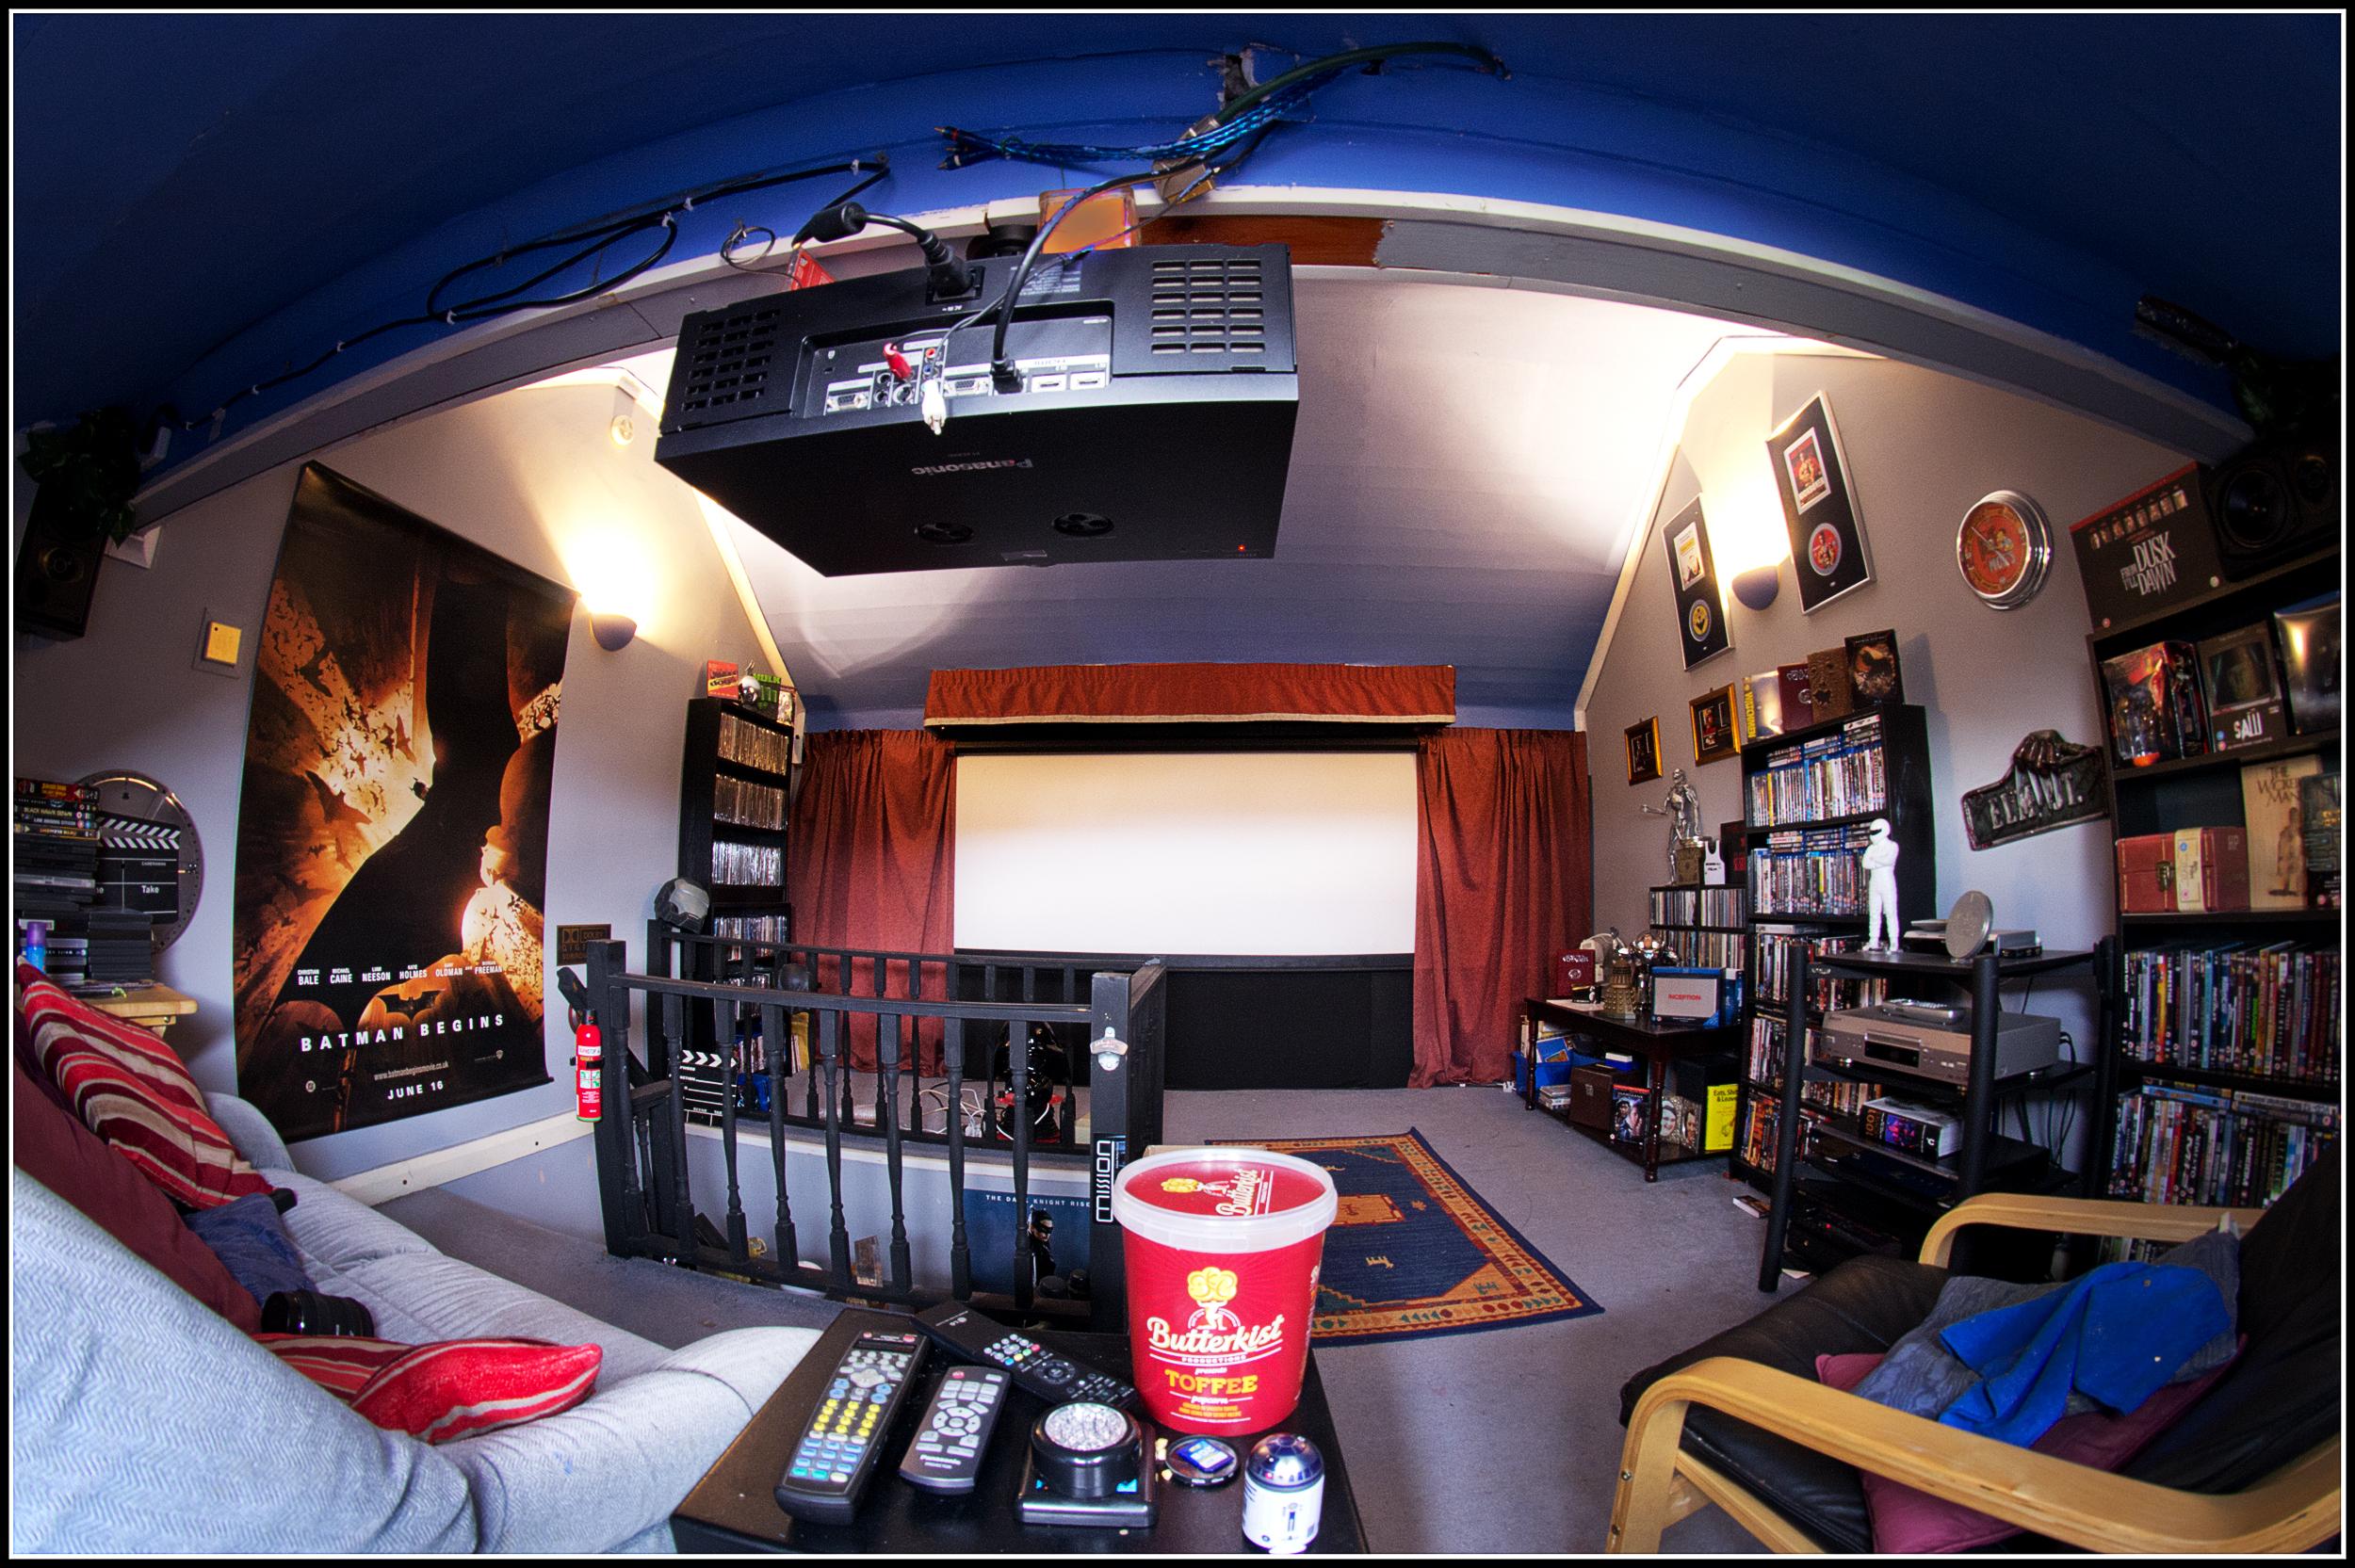 Bildschirm Bar Sammlung Dachboden Zimmer Innenarchitektur Poster Fisheye  Kino Sigma Beamer DVD Wakefield Panasonic Lautsprecher 8mm